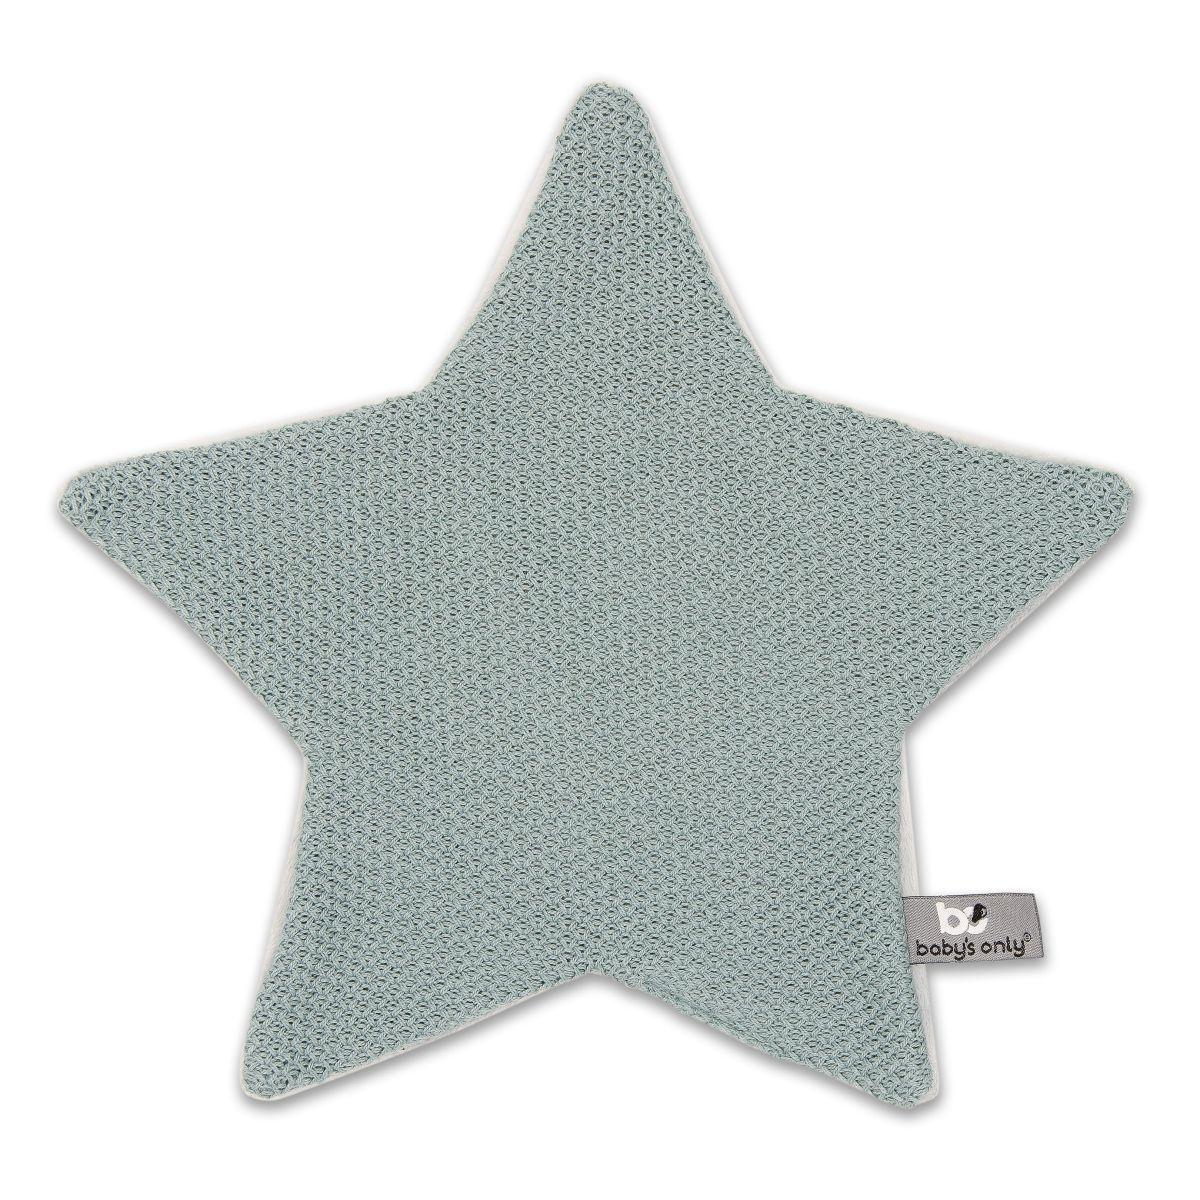 kuscheltuch stern classic stonegreen